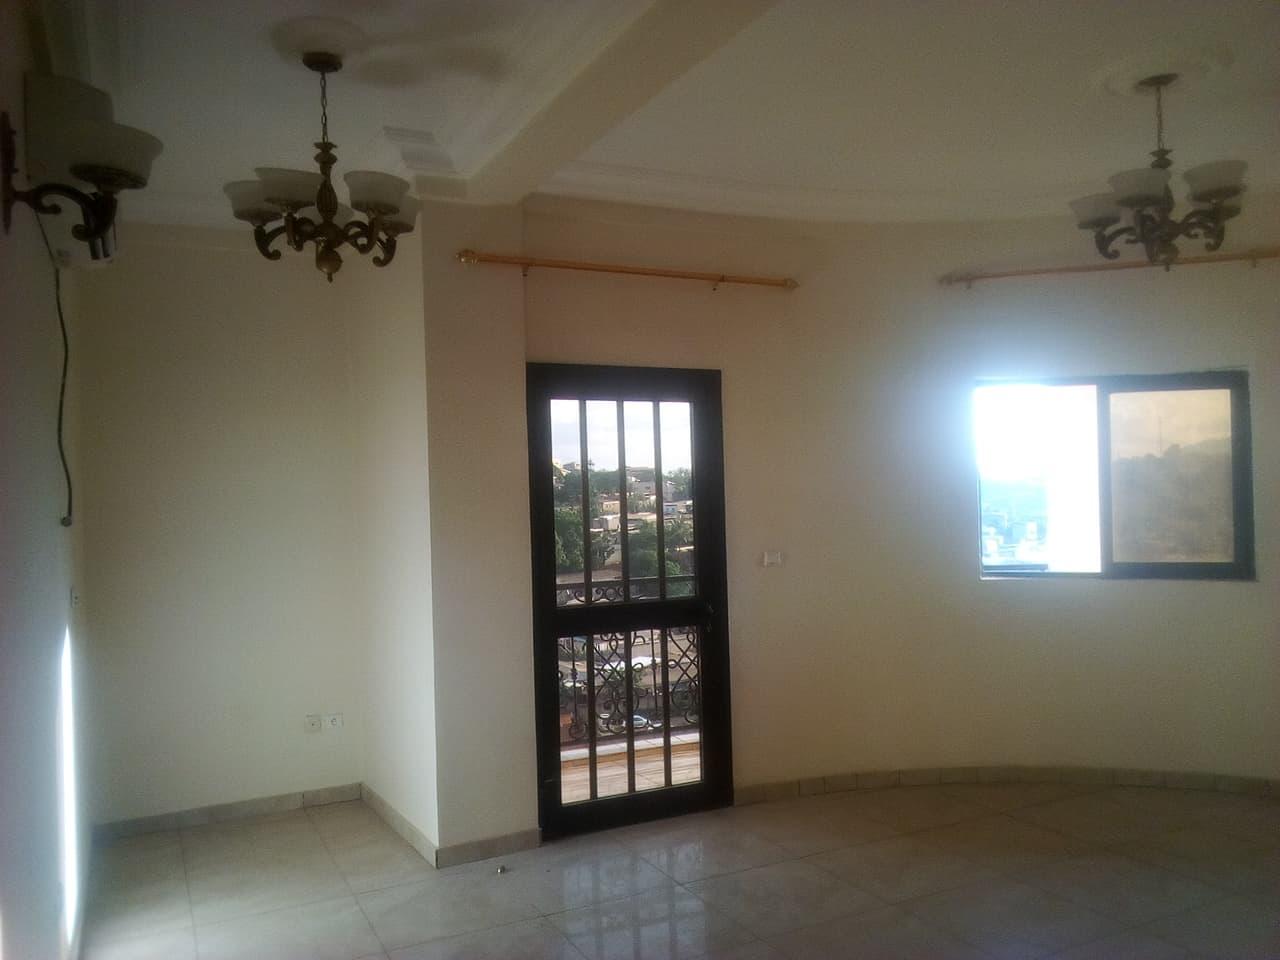 Apartment to rent - Yaoundé, Ngousso, fabrique - 1 living room(s), 2 bedroom(s), 3 bathroom(s) - 200 000 FCFA / month